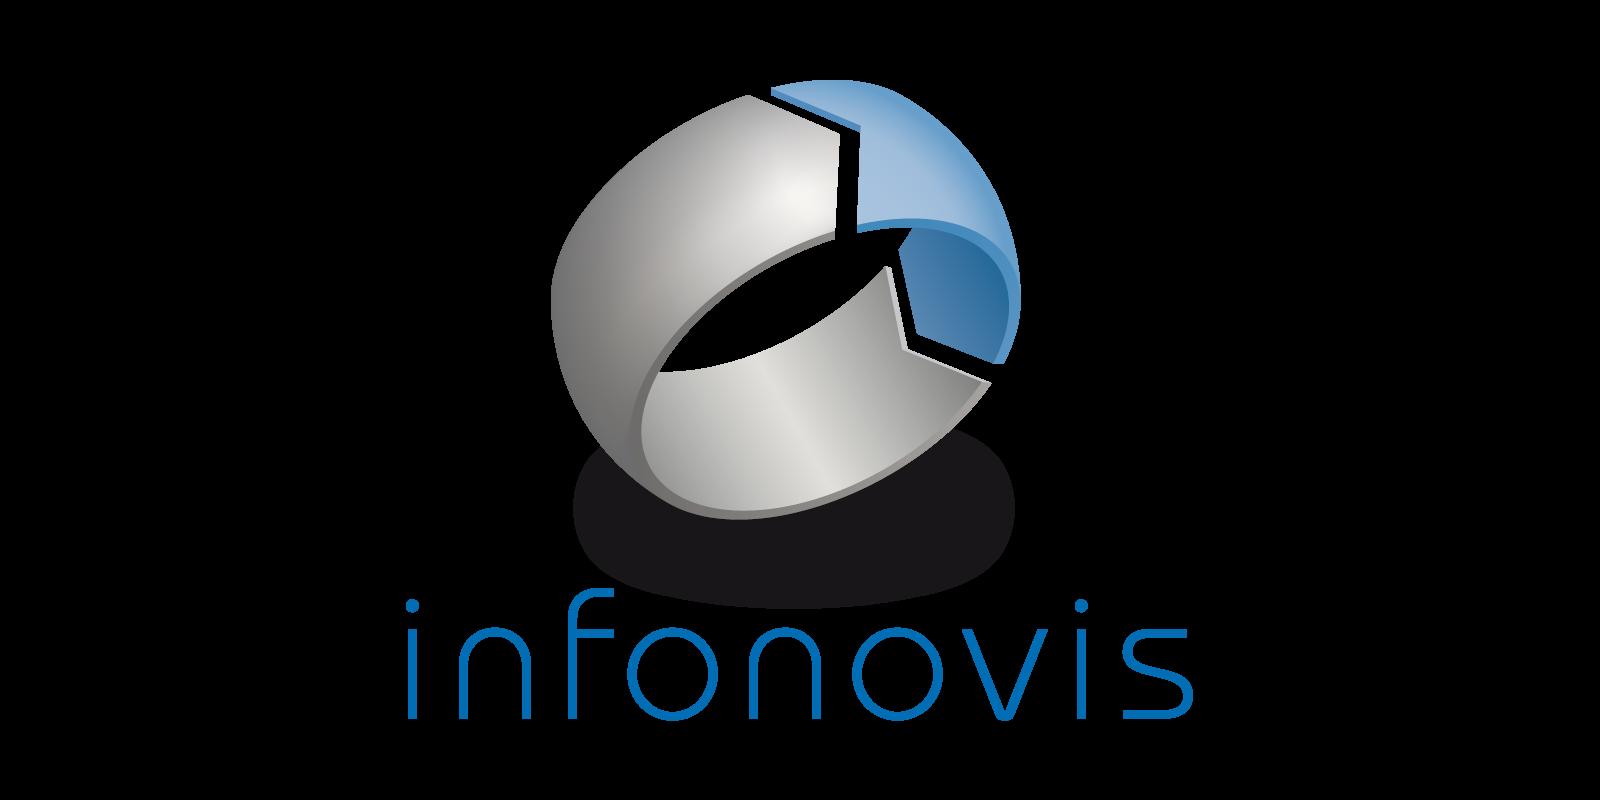 Infonovis.png